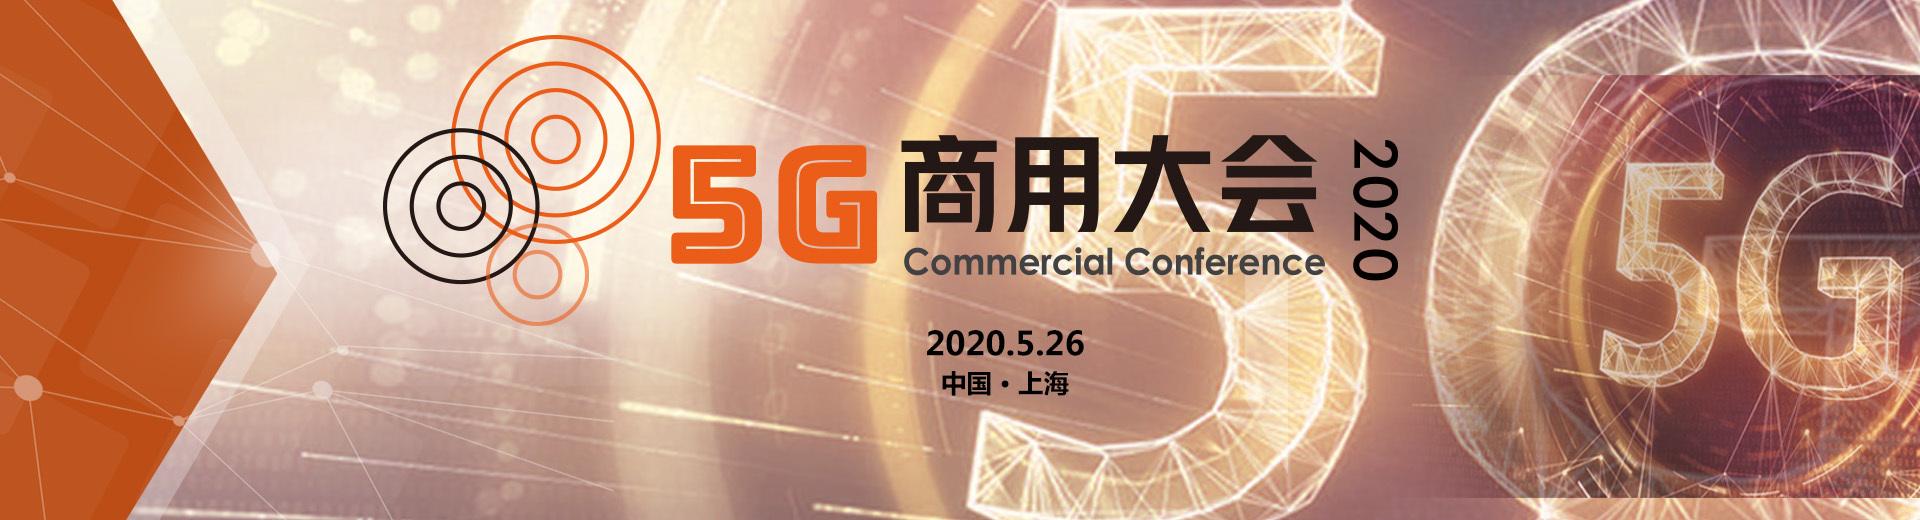 5G商用大会2020.06.18 上海